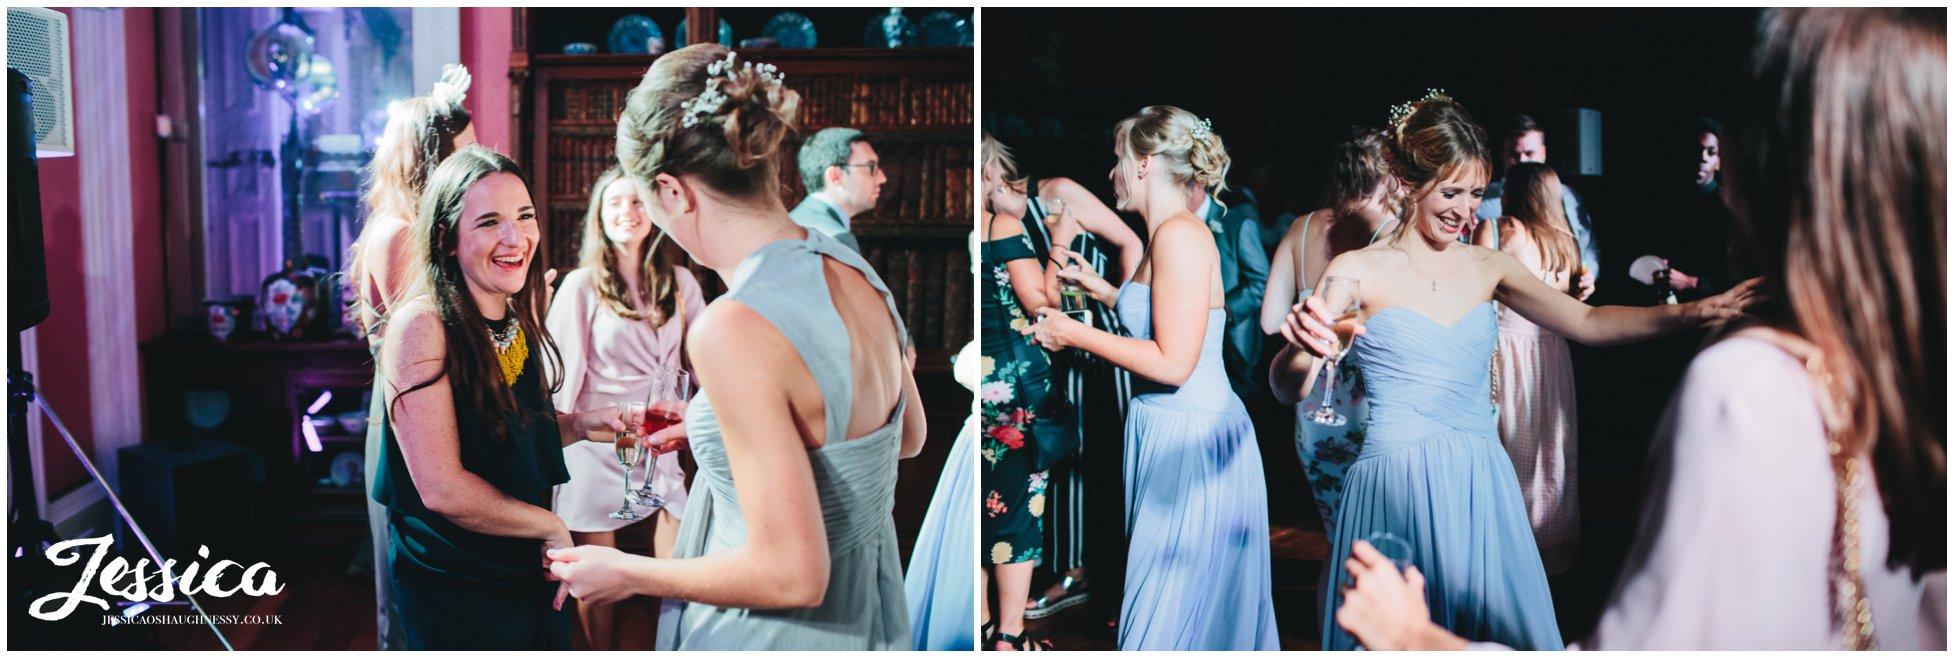 bride & grooms friends dancing